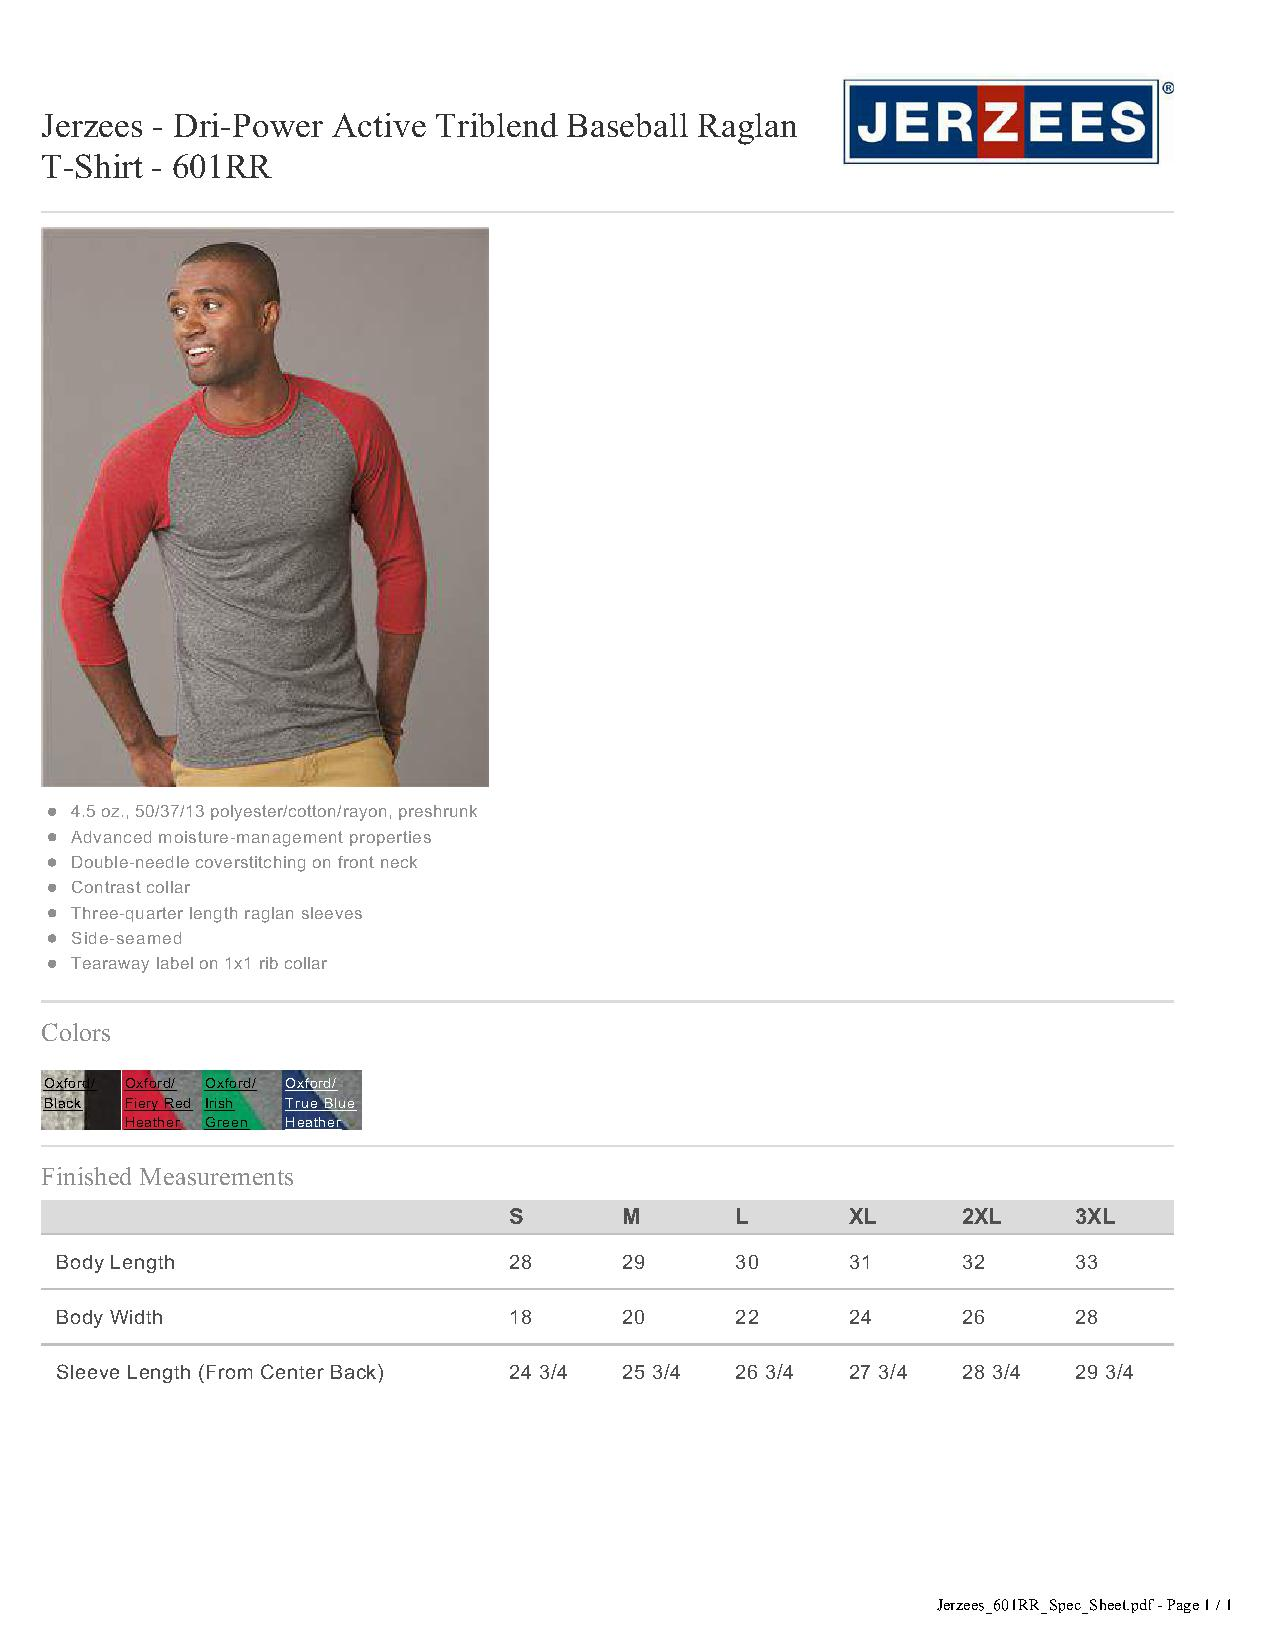 ac7dbace6ef Jerzees 601RR - Dri-Power Active Triblend Baseball Raglan T-Shirt ...